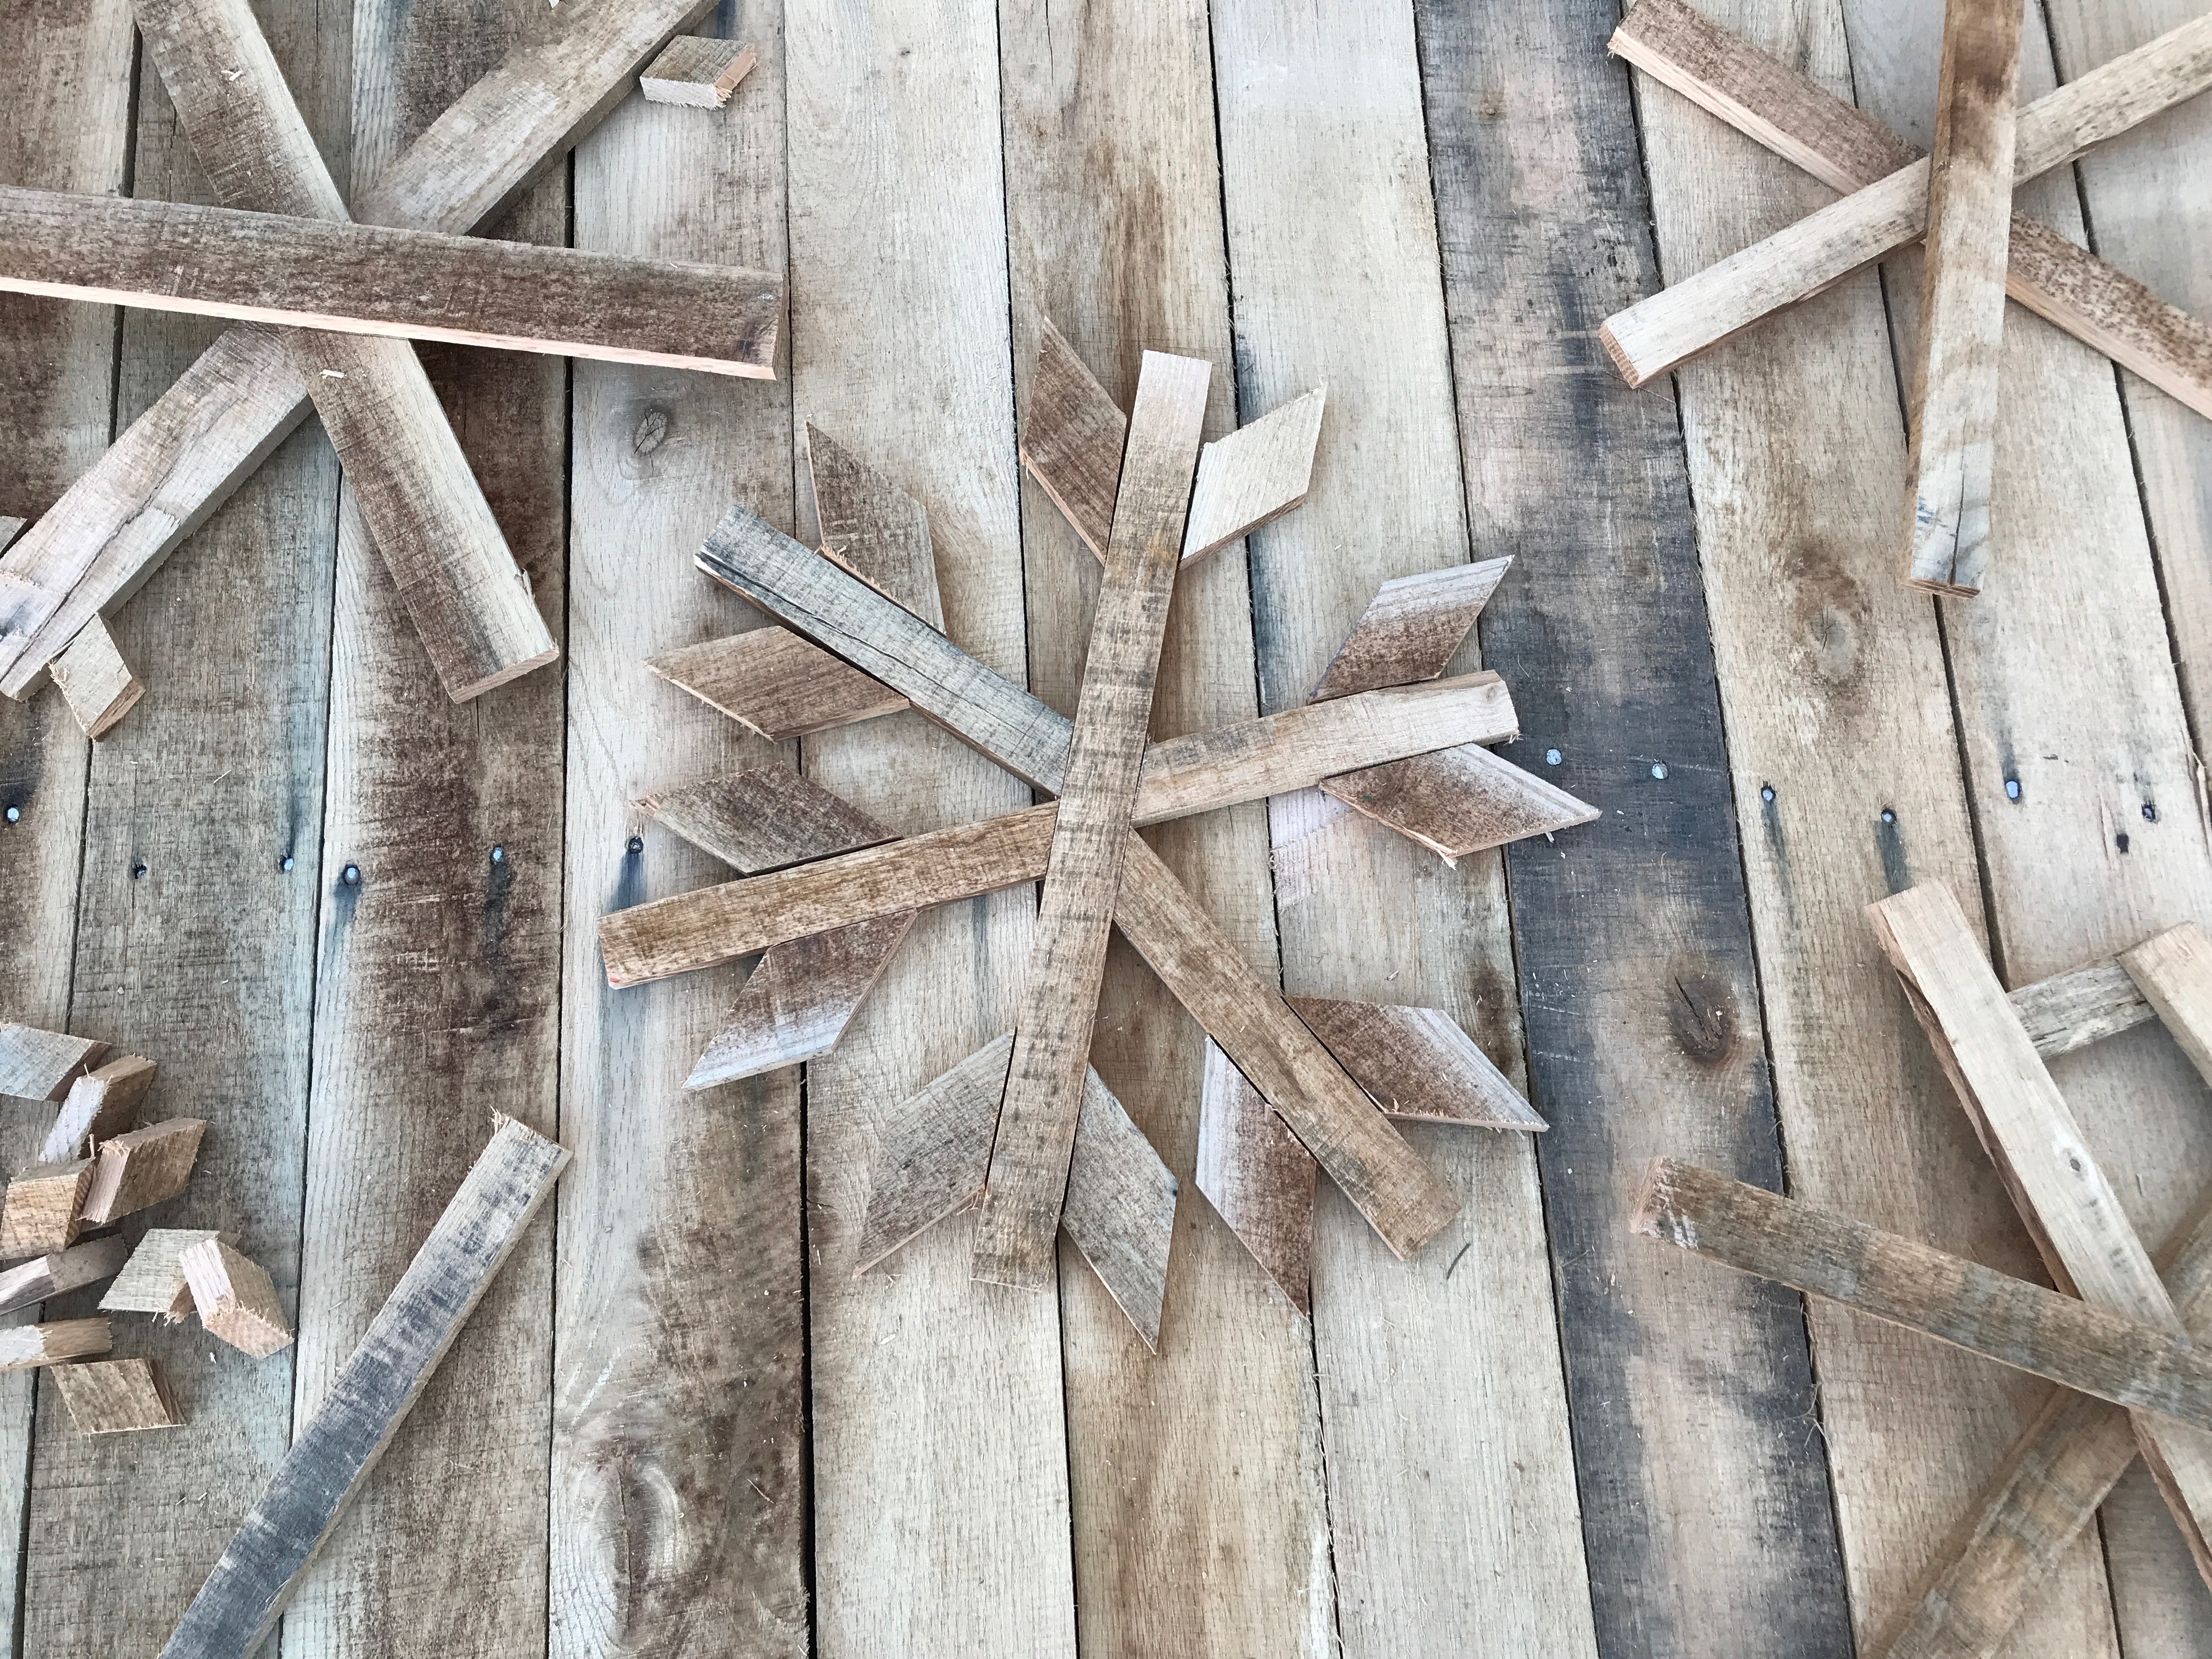 6 MyFixitUpLife Krylon Pallet December Holiday Snowflake Pallet DIY snowflakes assembled